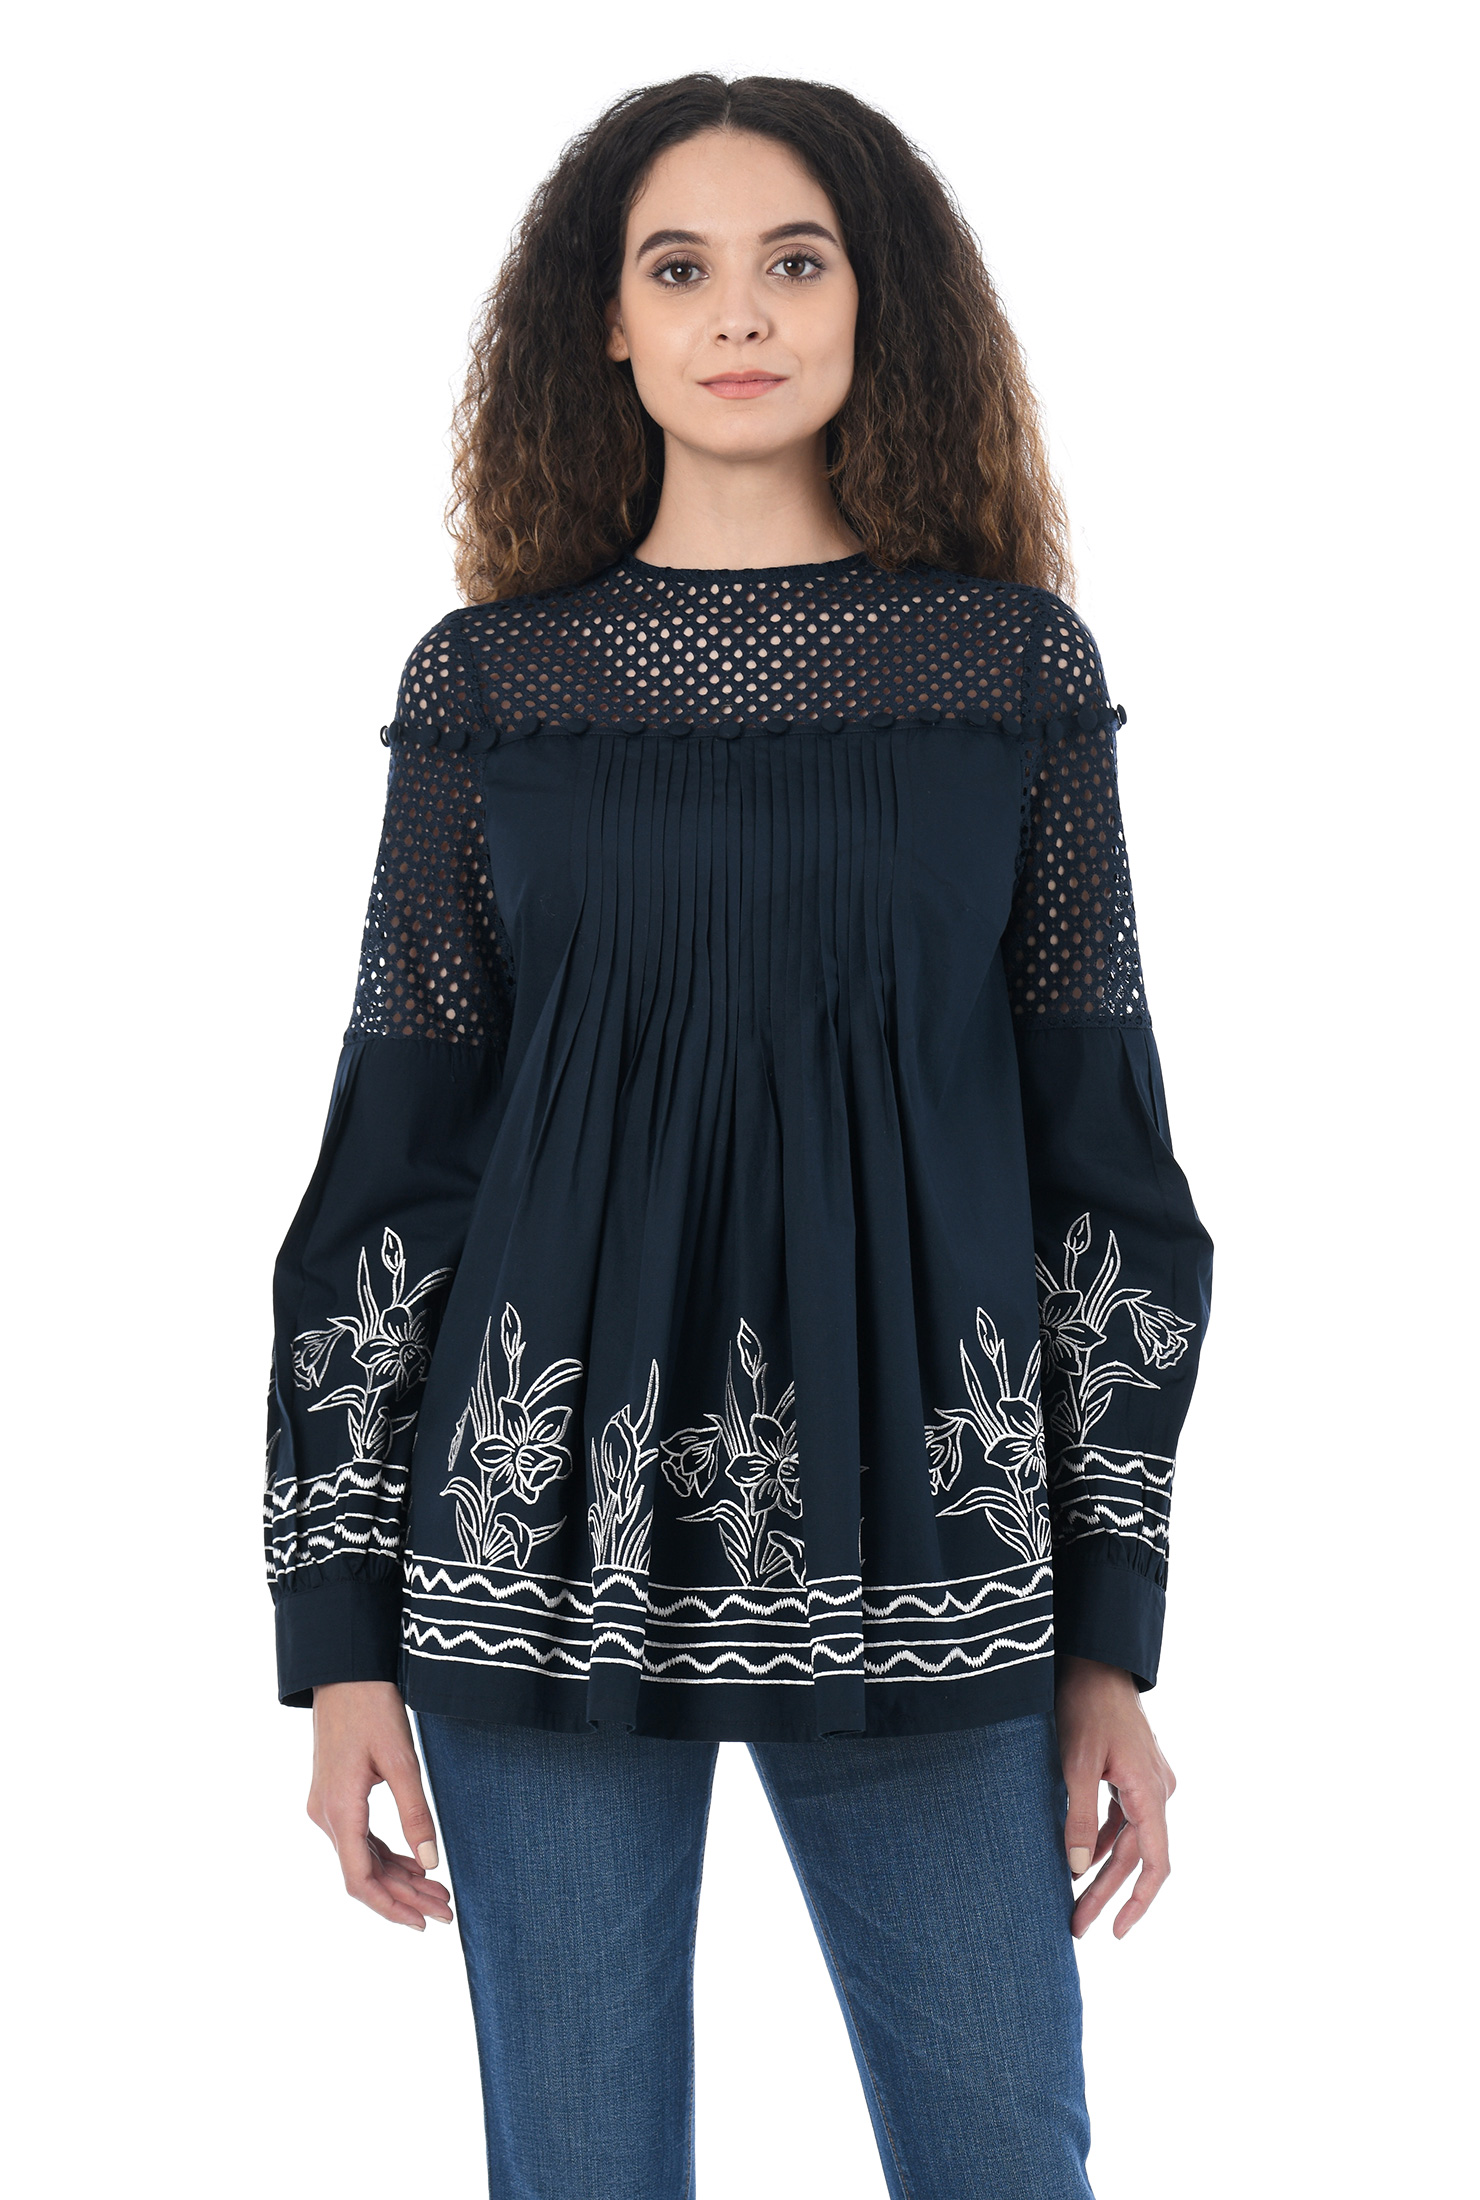 b8b28b522 Cotton/polyester tops, Long Sleeve Tops, low hip length tops, Machine